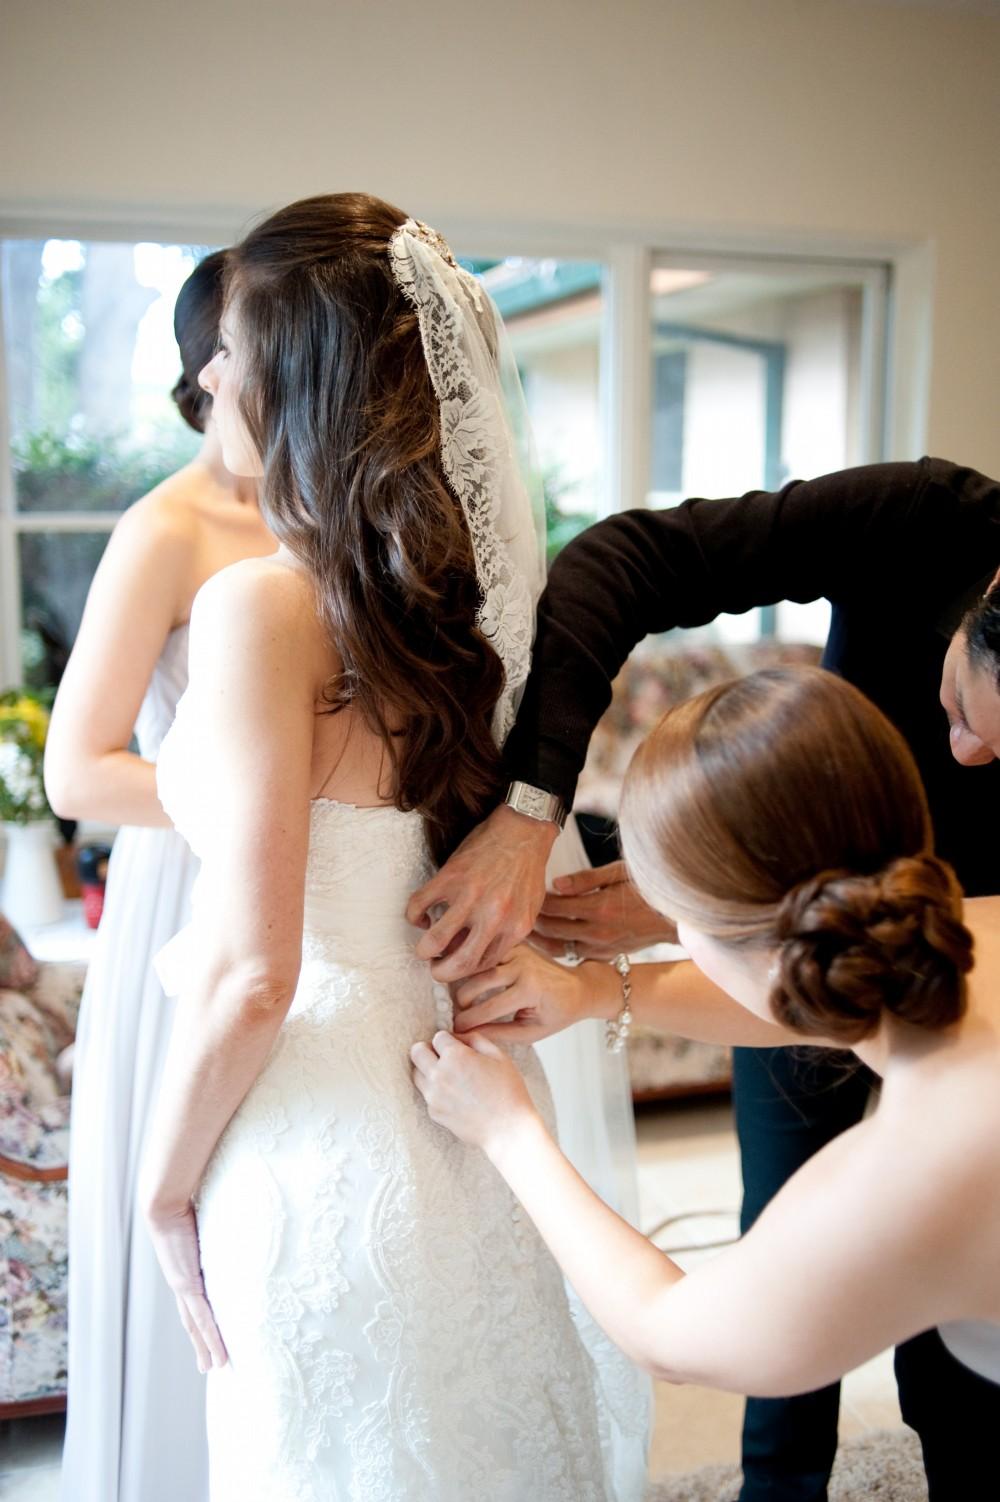 Alma novia rubidio second hand wedding dress on sale 76 off for Second hand wedding dresses san diego